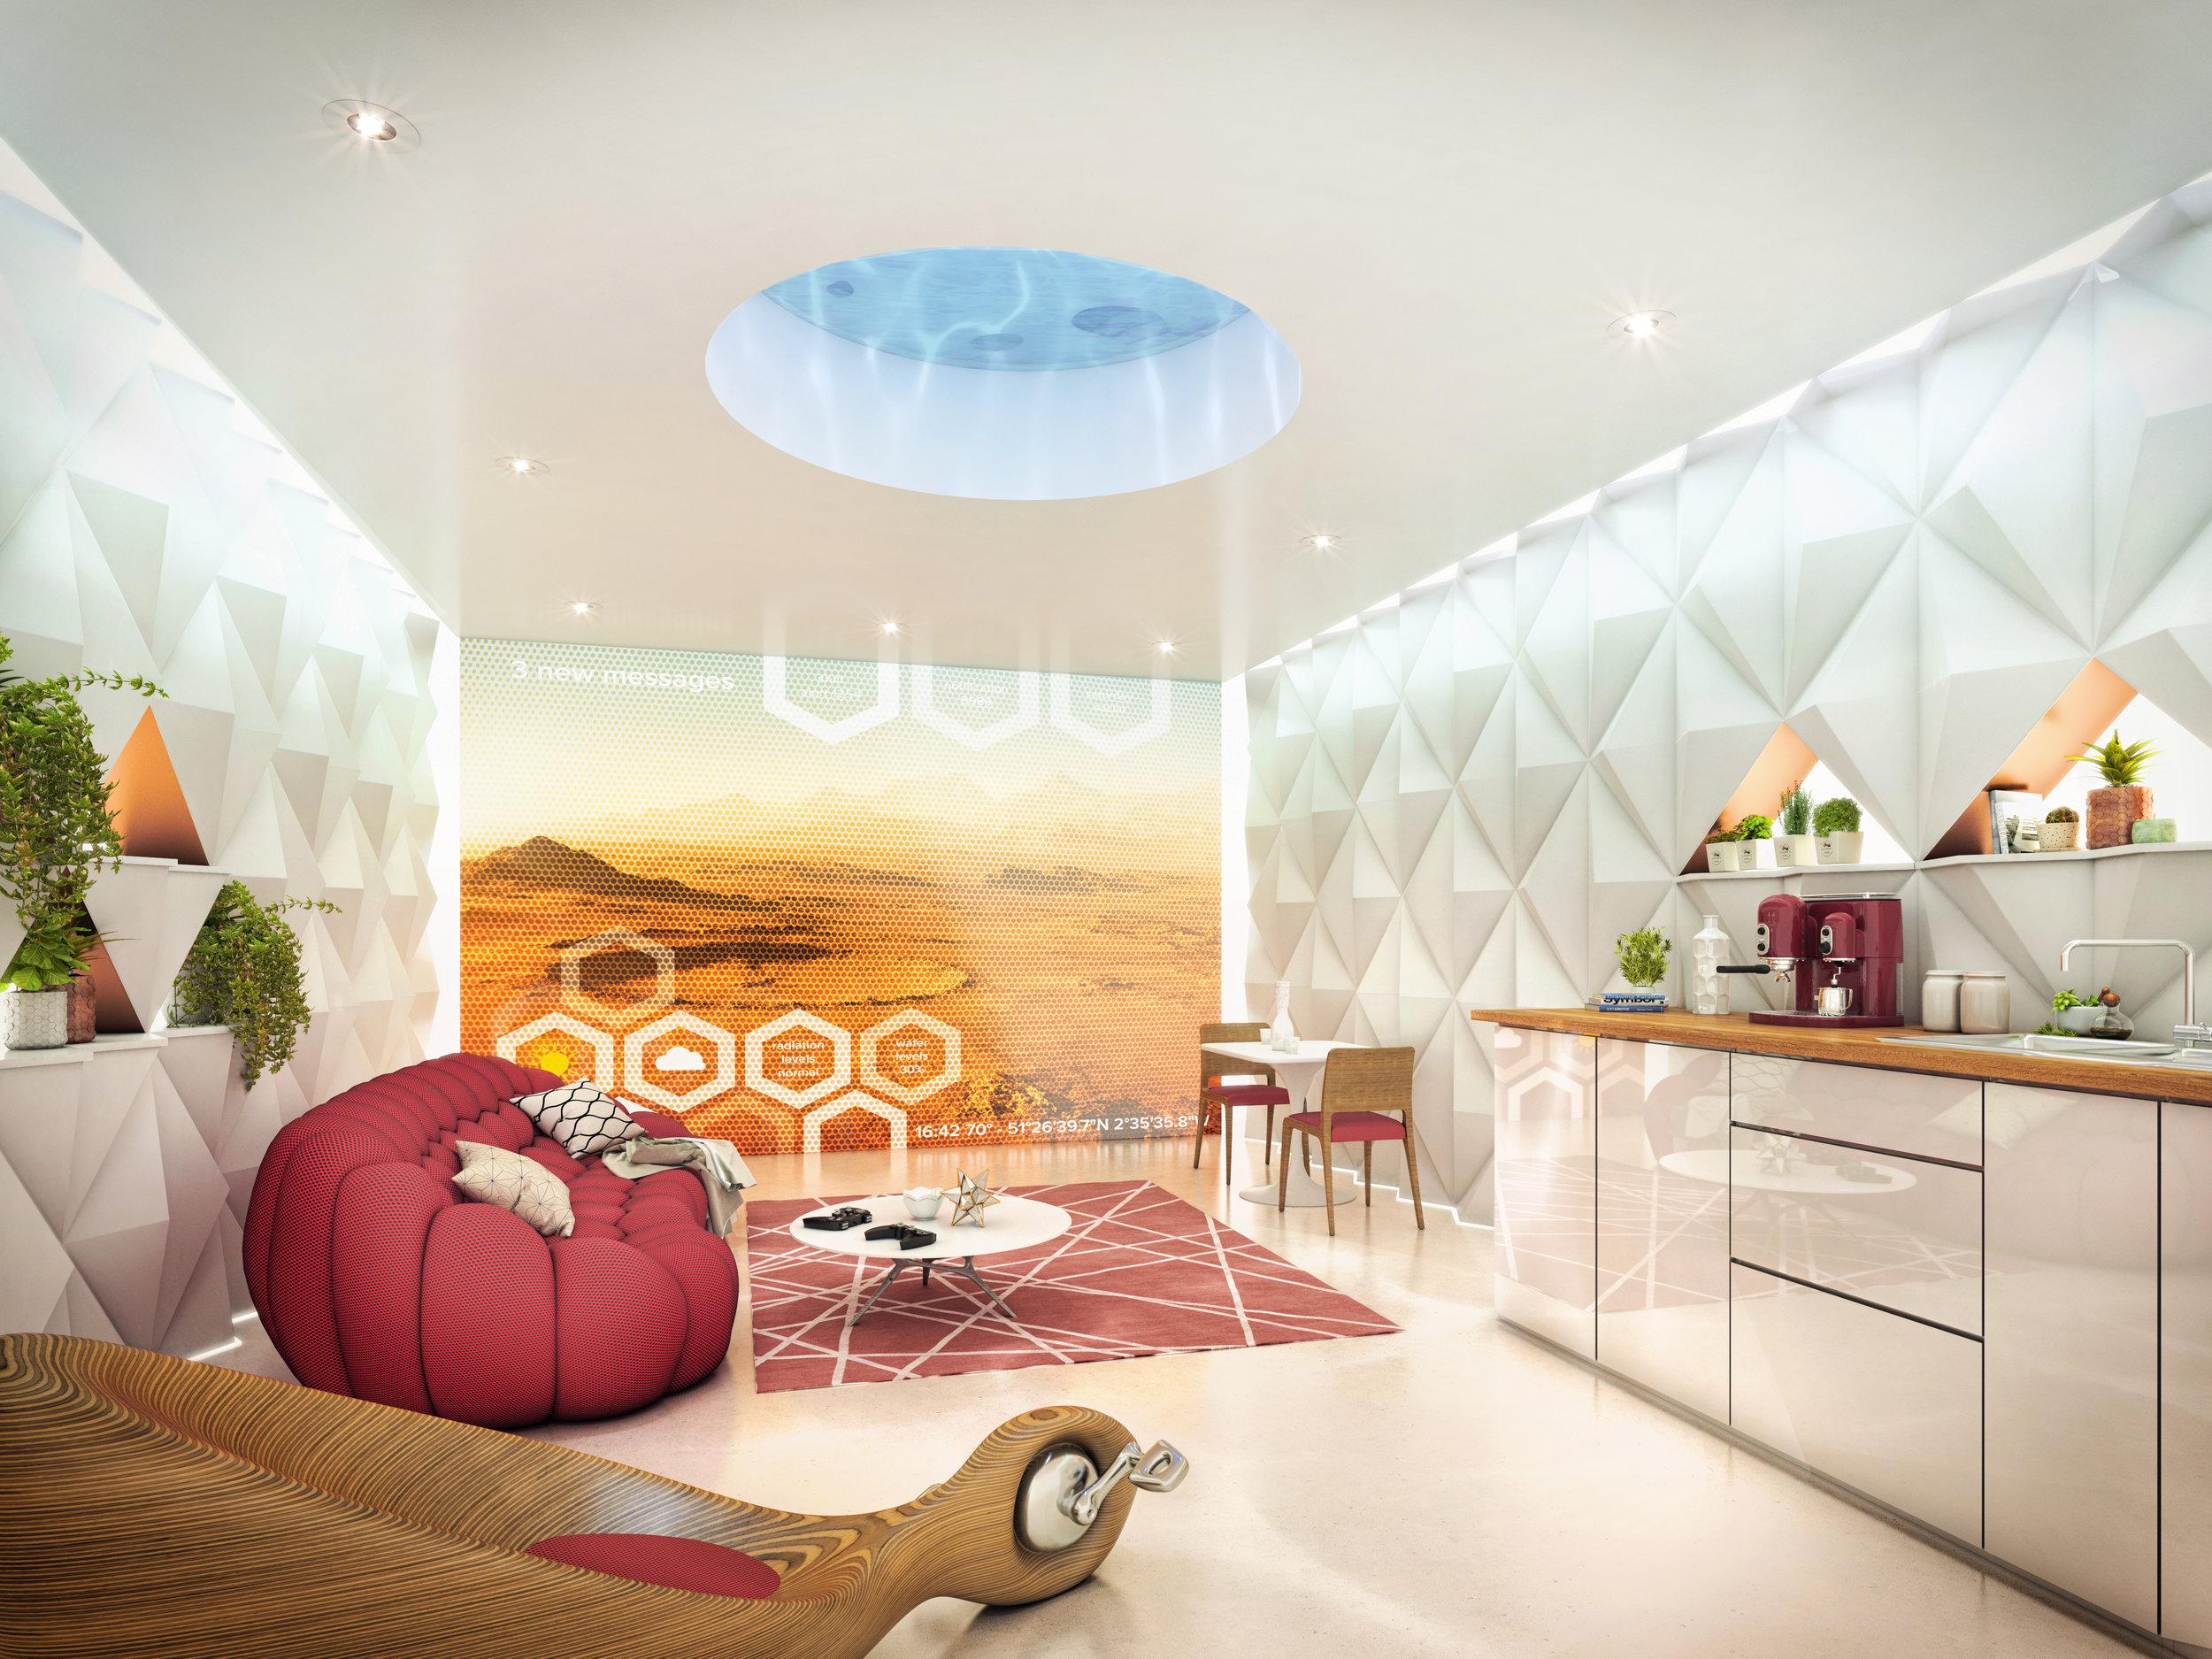 Mars Apartrment Interior.jpg